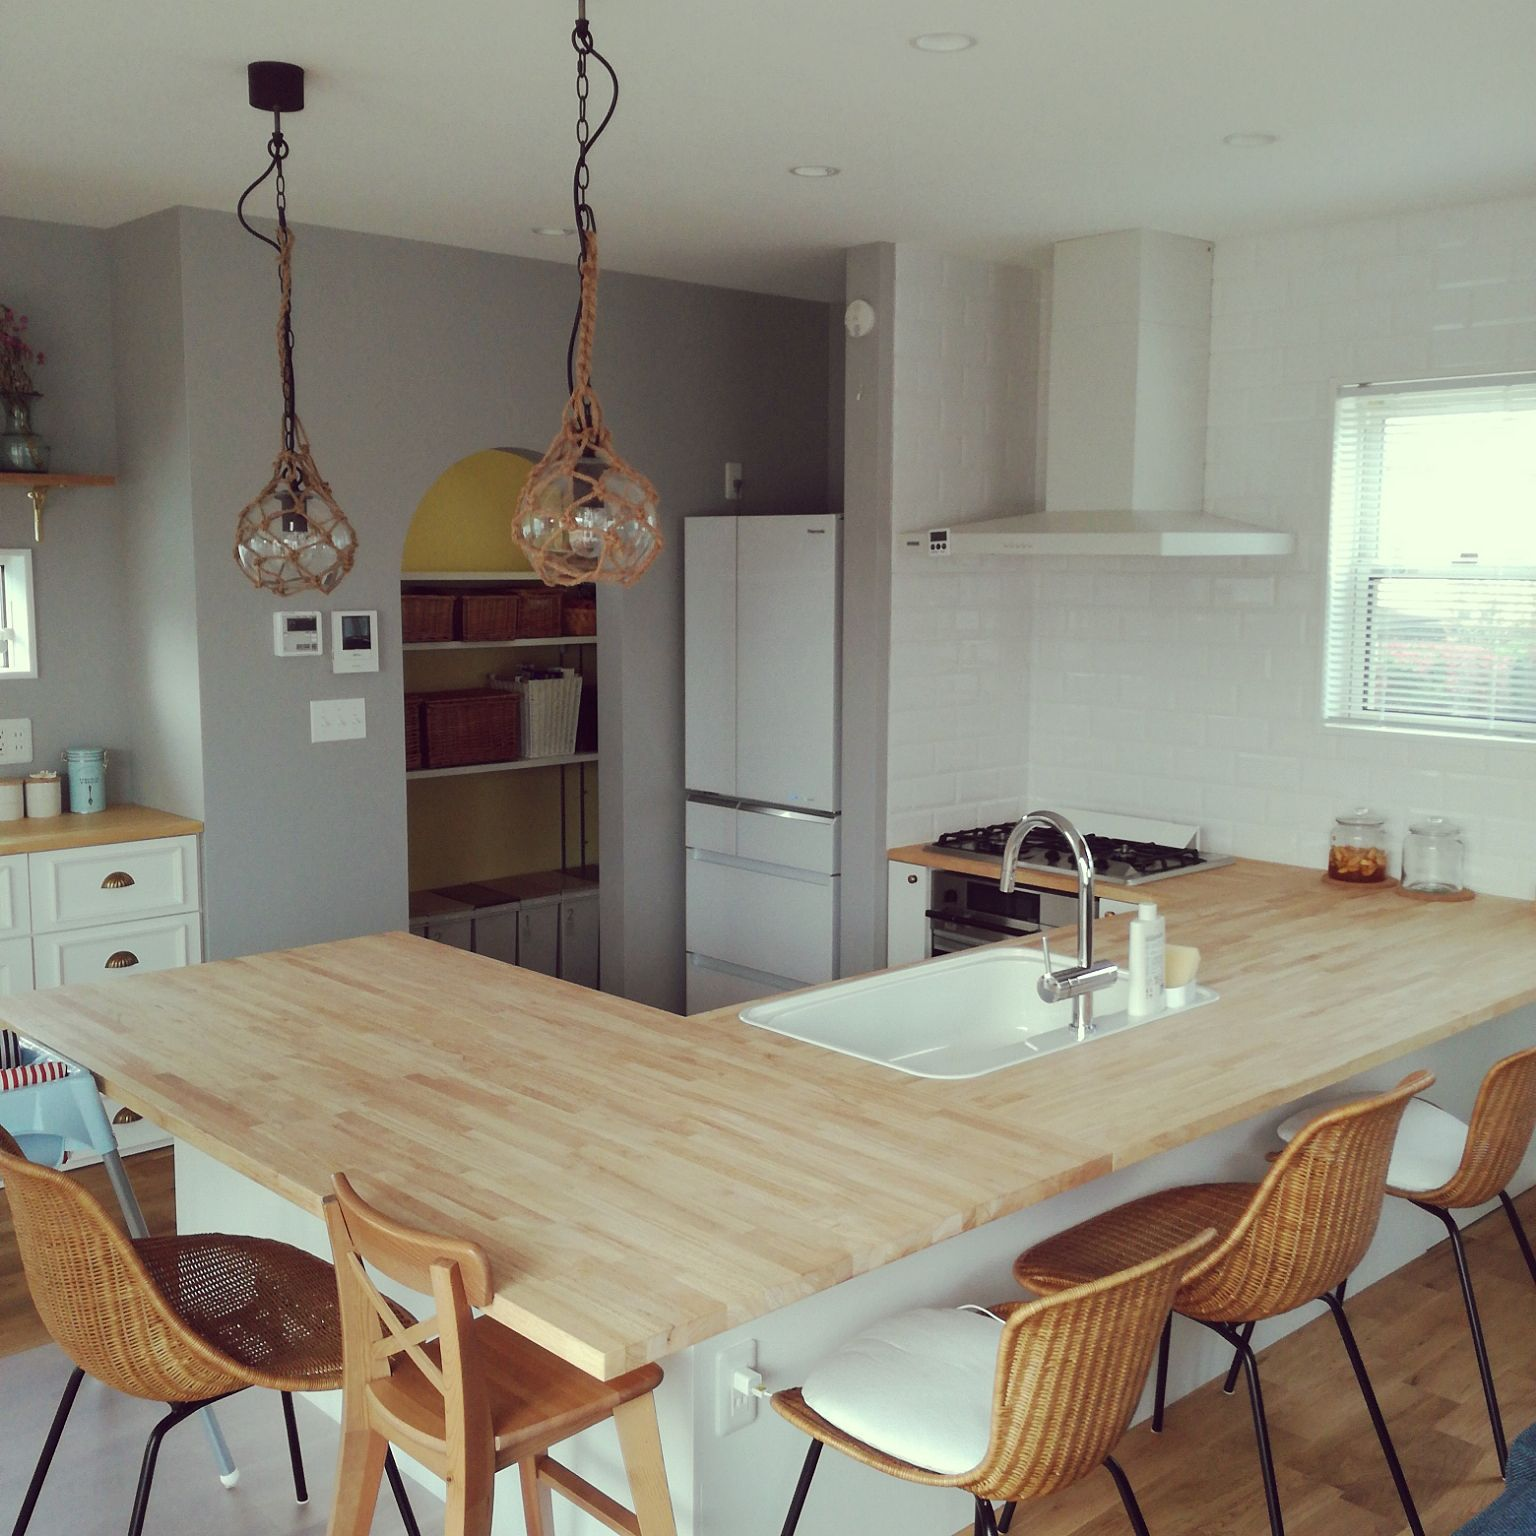 Kitchen Impossible Idee: キッチン/名古屋モザイクタイル/IDEE/造作キッチン/GROHE/コの字型キッチンのインテリア実例